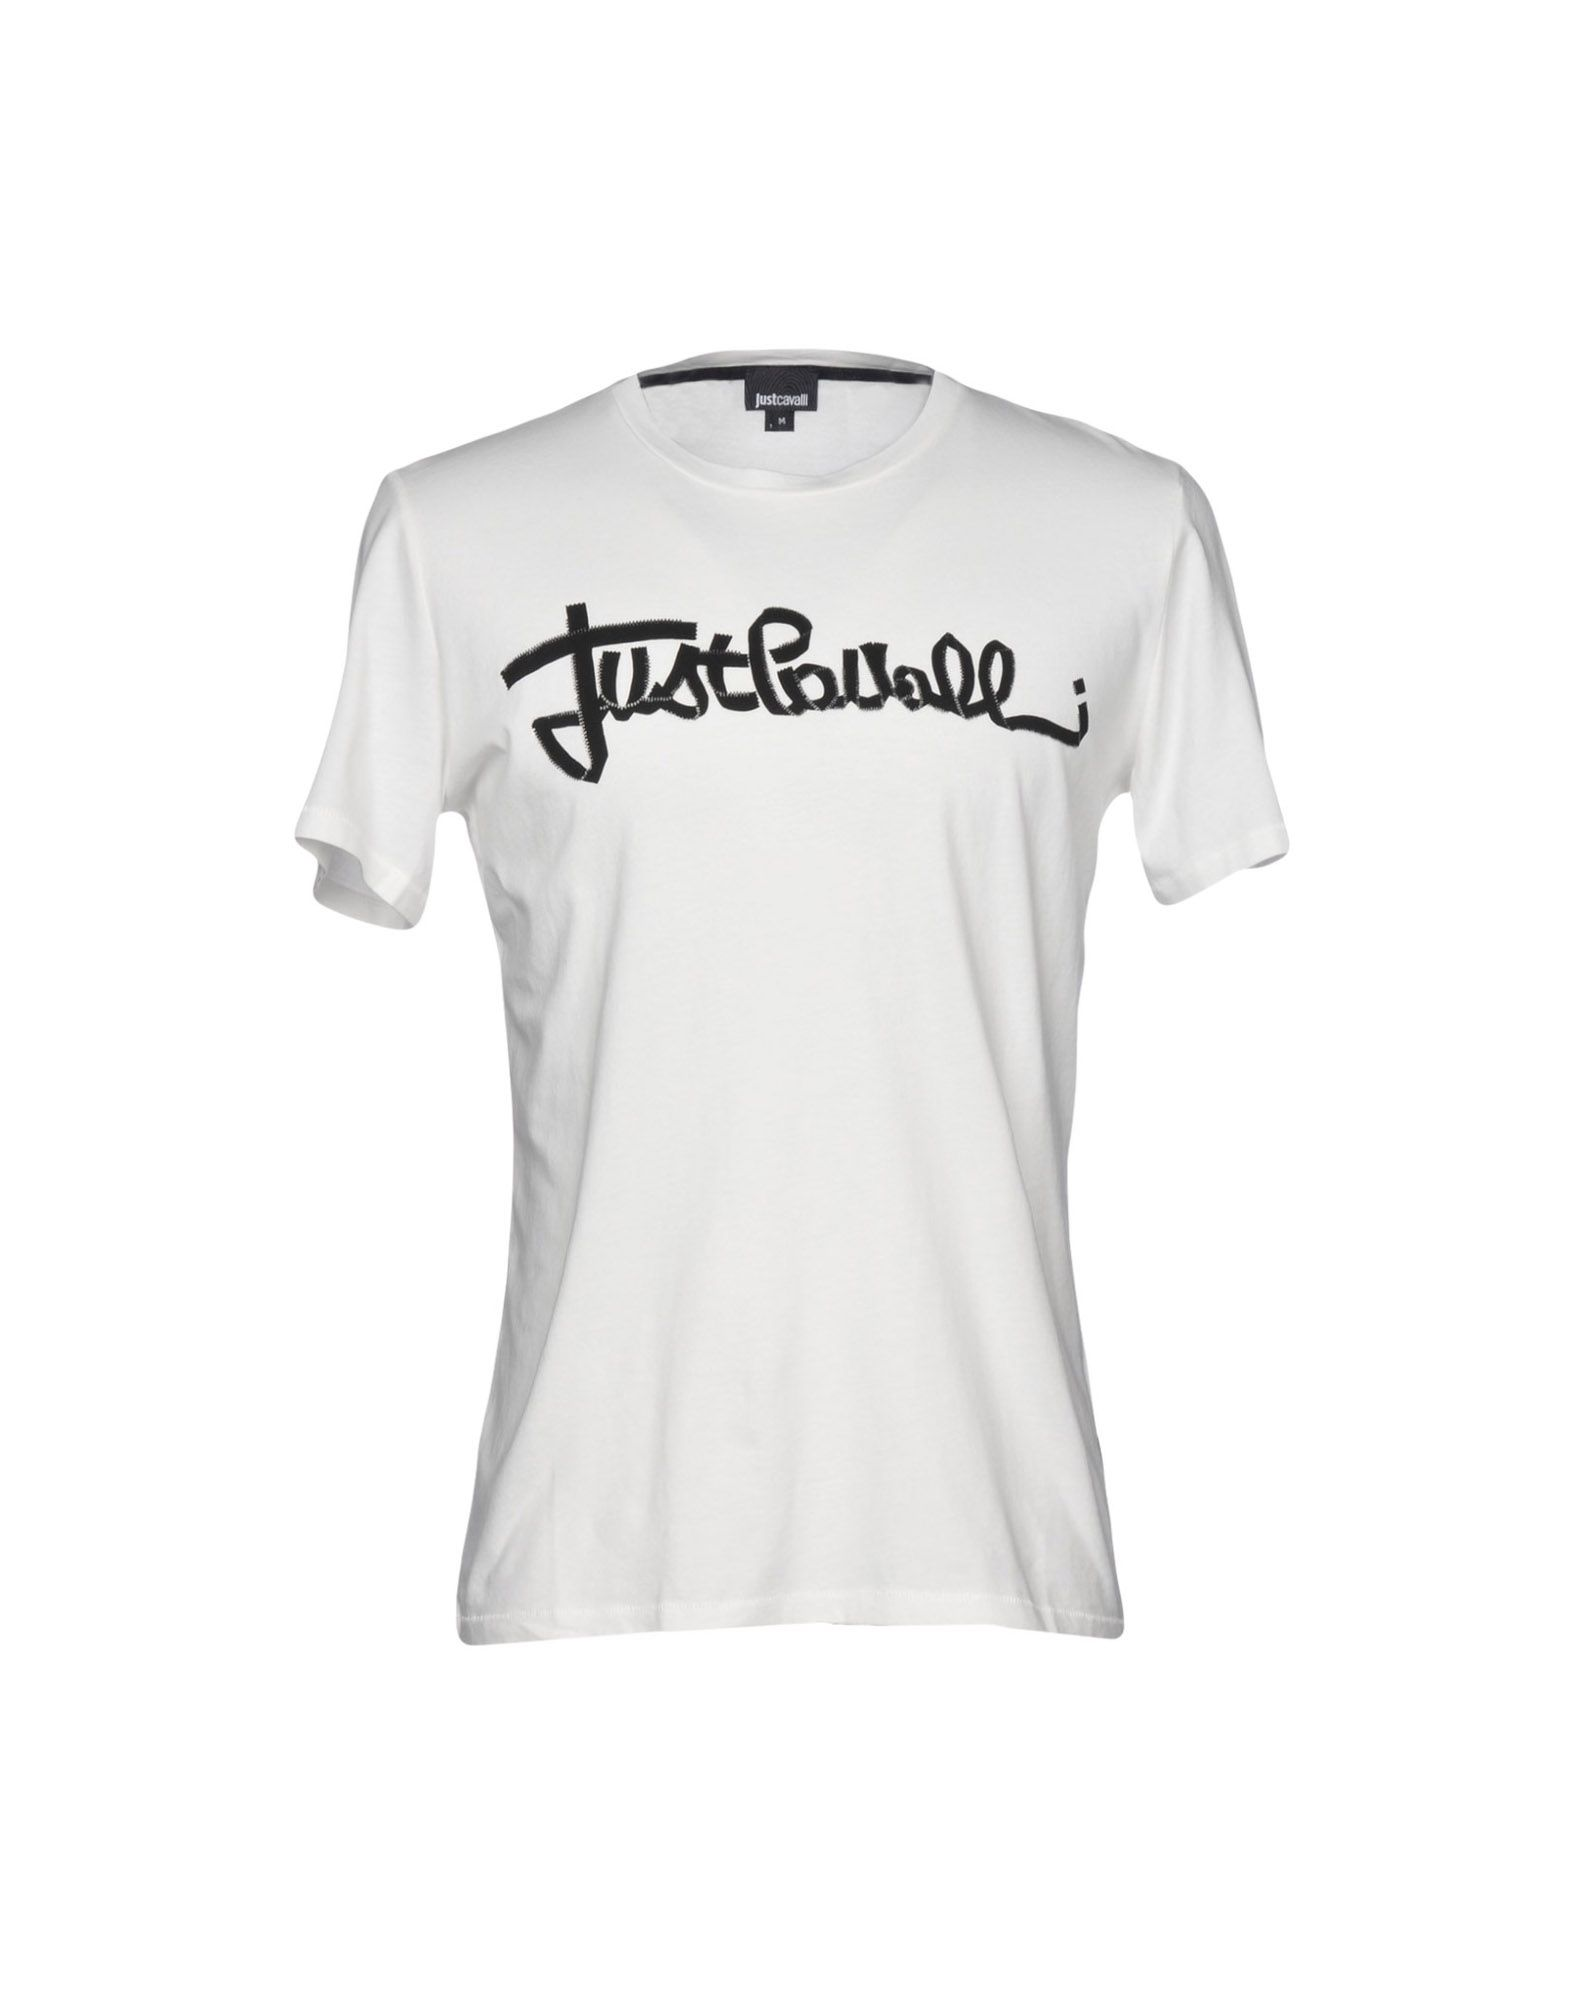 JUST CAVALLI Футболка футболка just cavalli just cavalli ju662emopd29